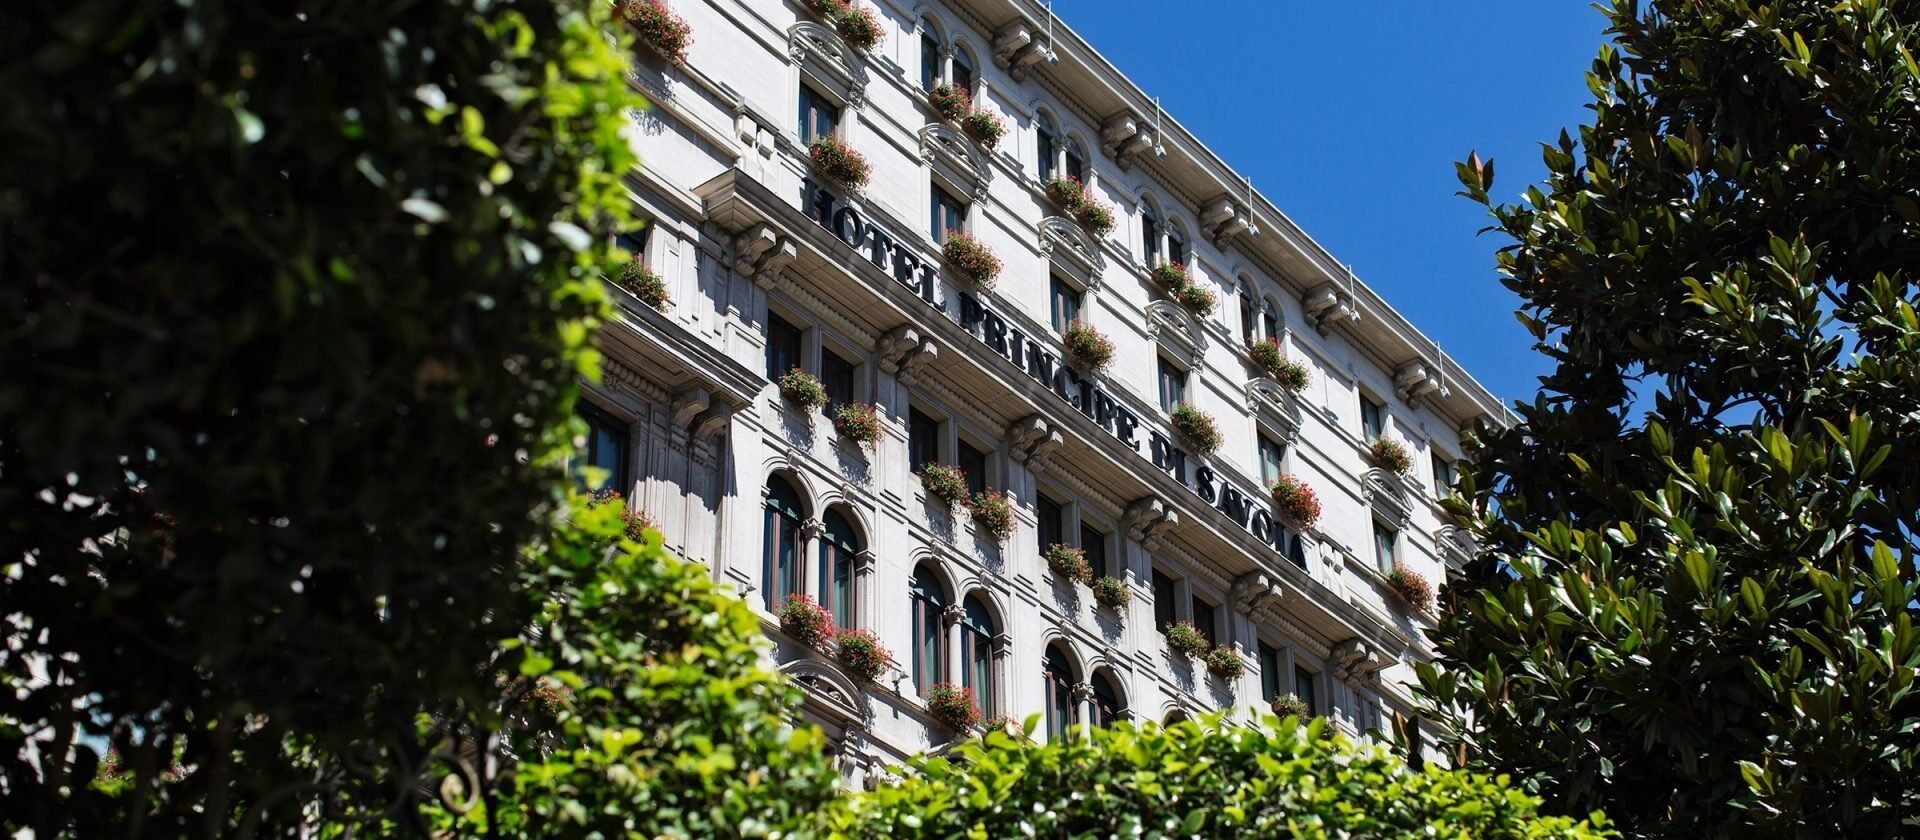 Exterior view of Hotel Principe di Savoia